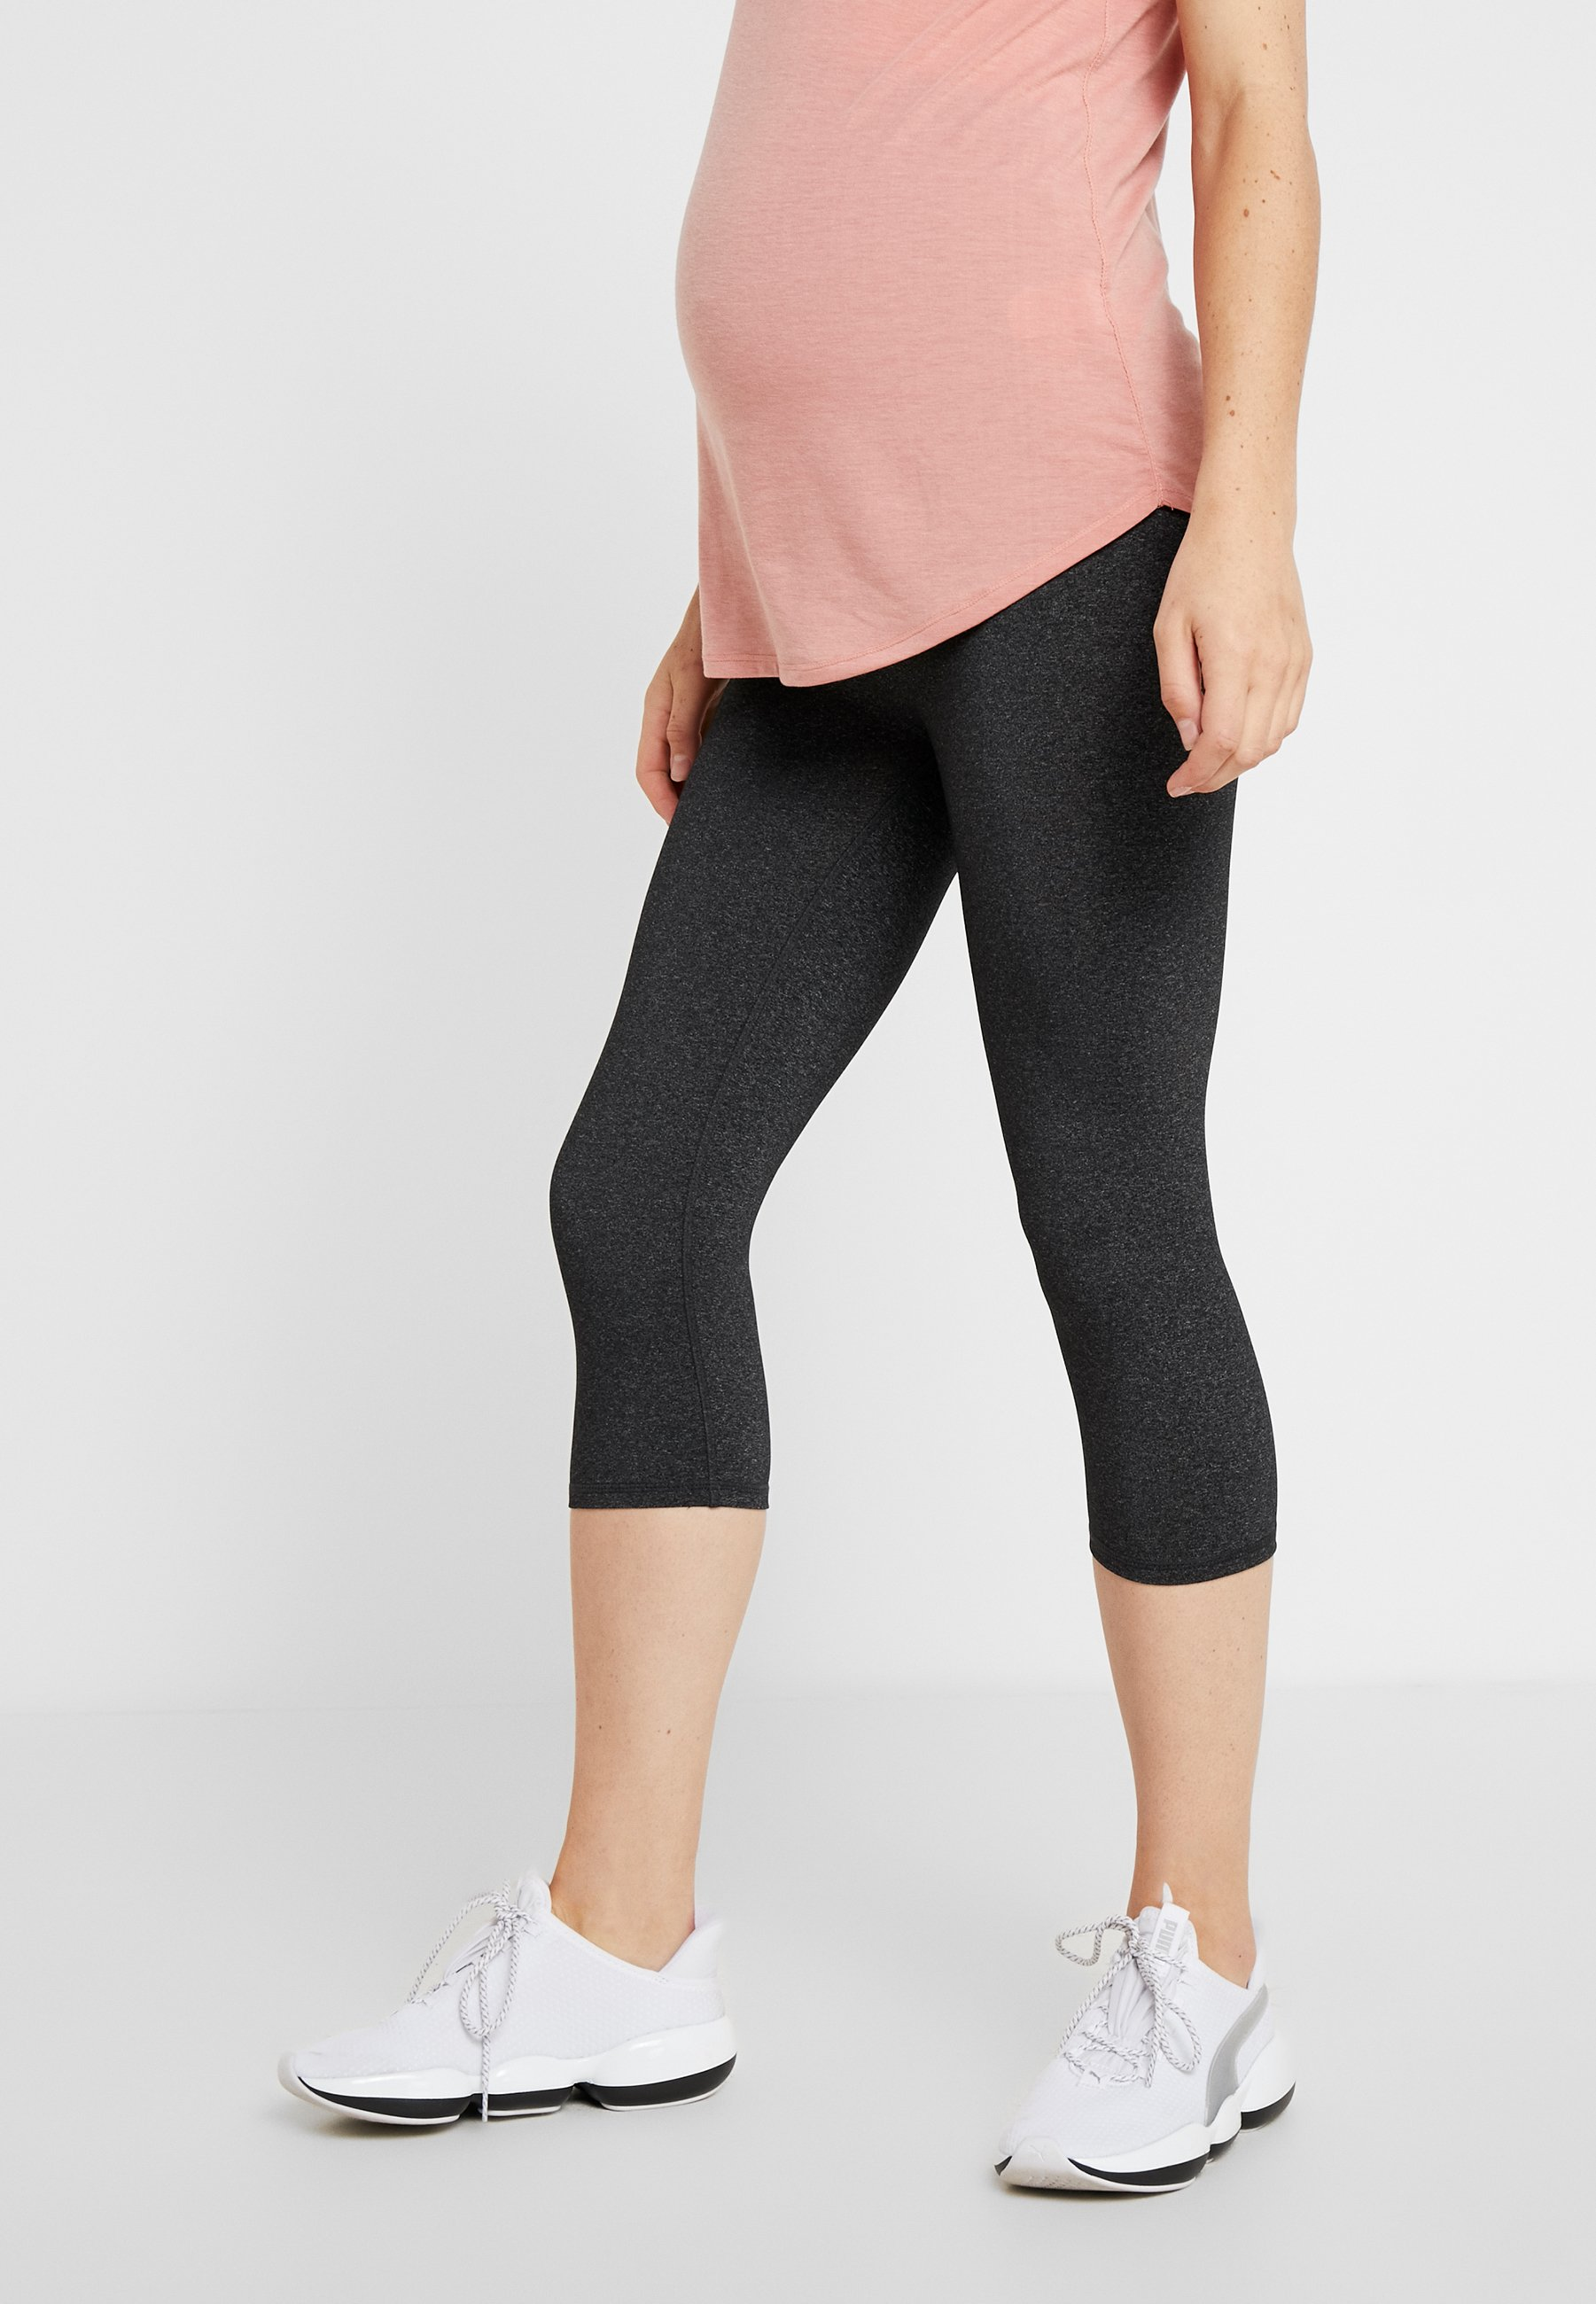 Femme CORE CAPRI OVER BELLY TIGHT - Pantalon 3/4 de sport